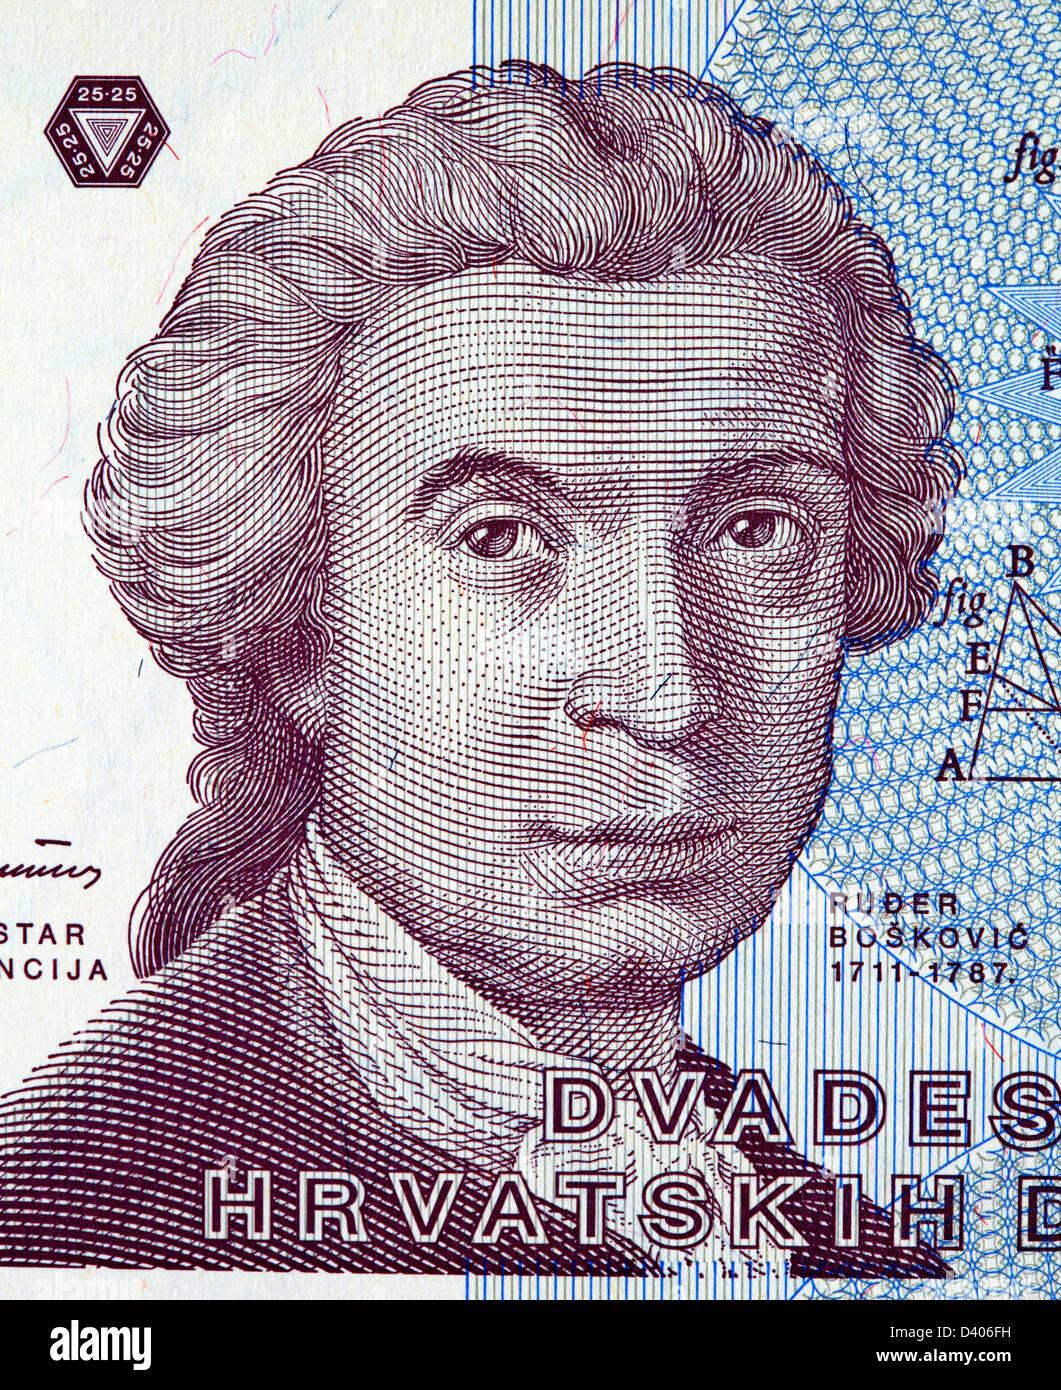 Portrait of Ruder Josip Boskovic from 25 Dinara banknotel, Croatia, 1991 Stock Photo